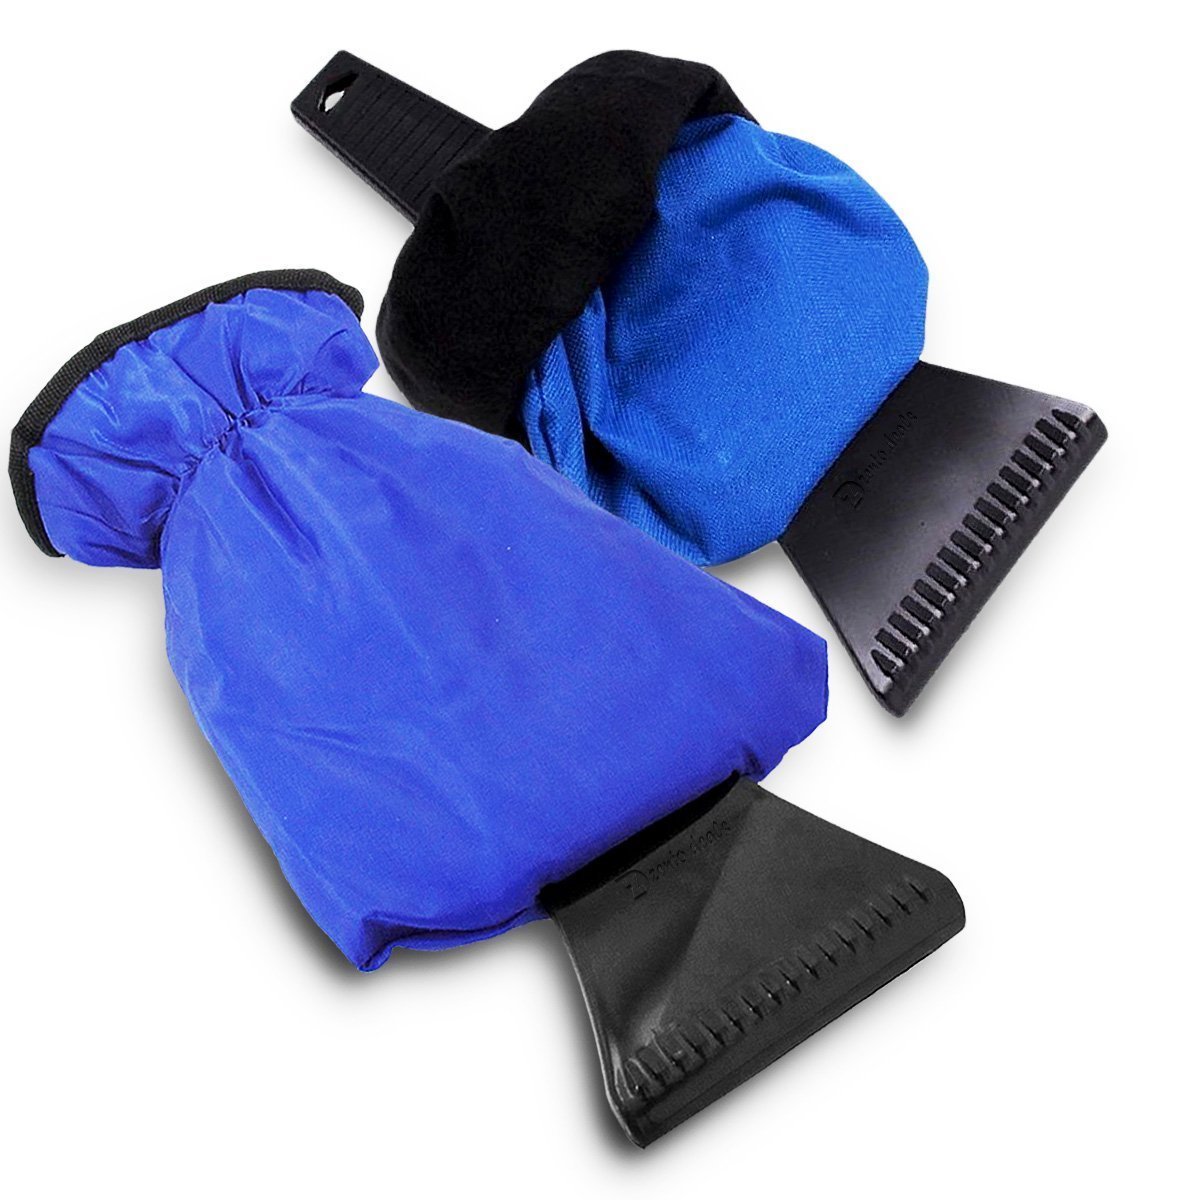 Zento Deals Waterproof Ice Scraper Vehicle Mitt - 2-Pack Superb Quality Blue Car Windshield Ice Snow Remover Glove